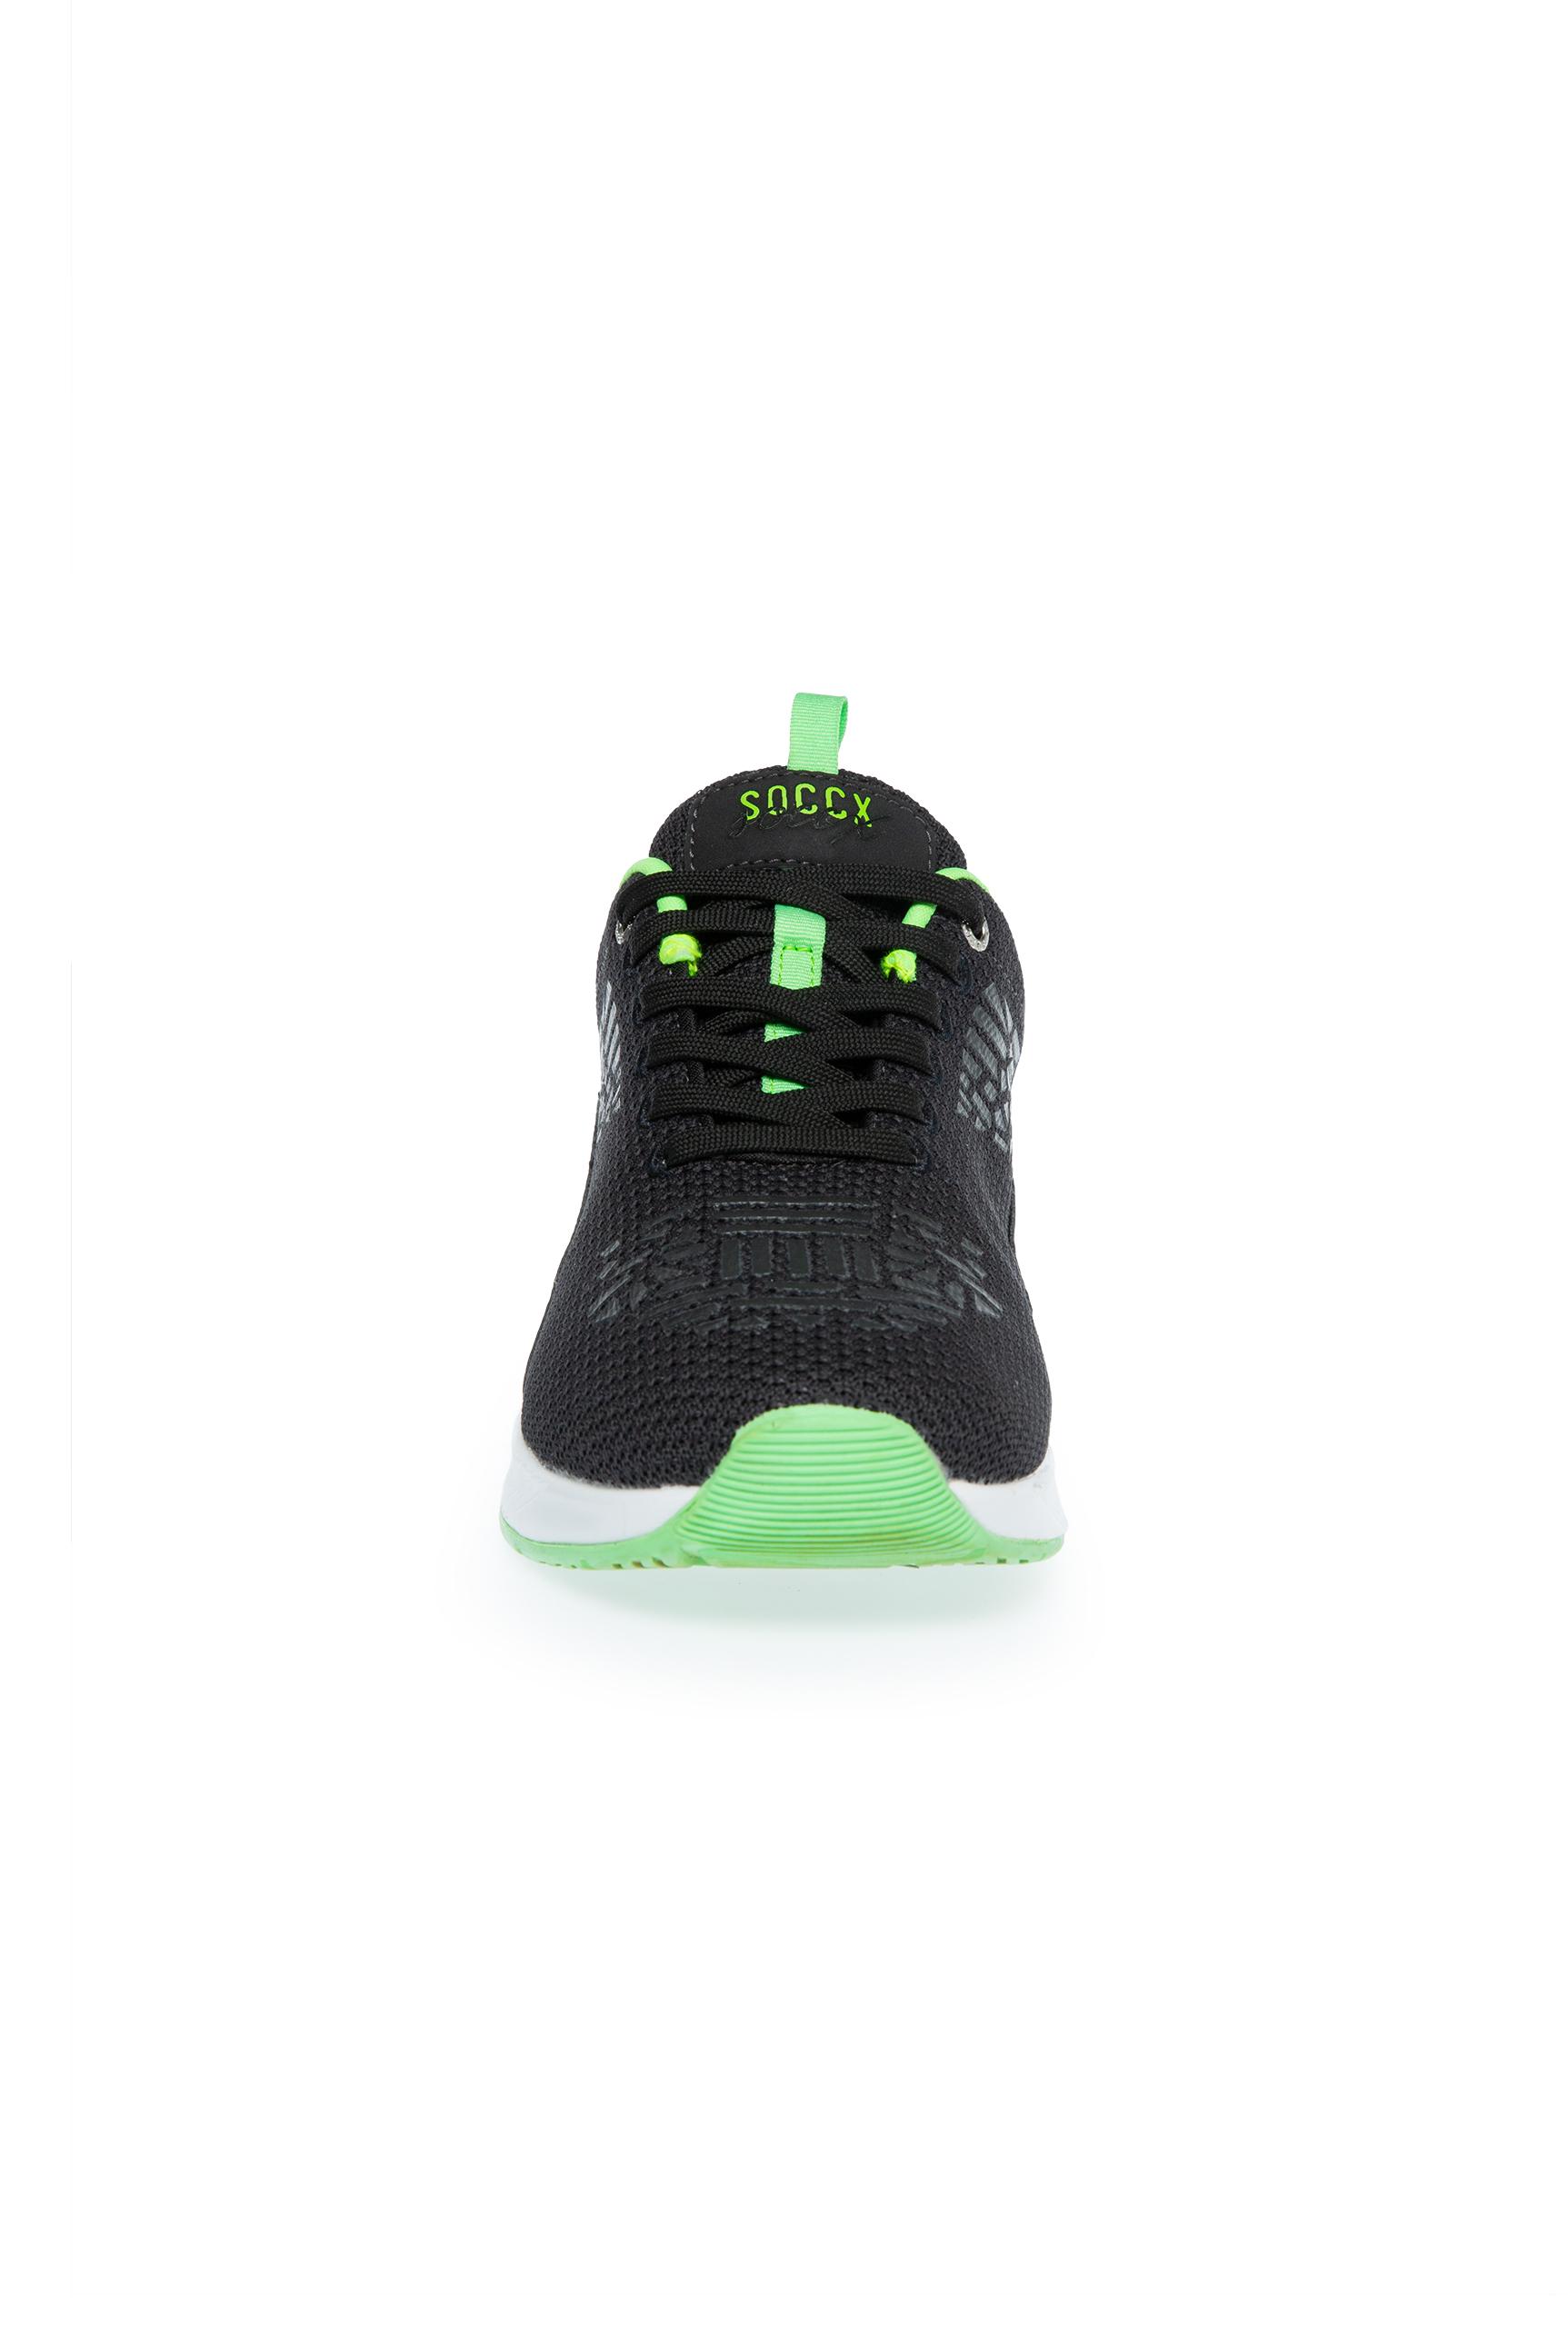 Textil-Sneaker mit Rubber-Print